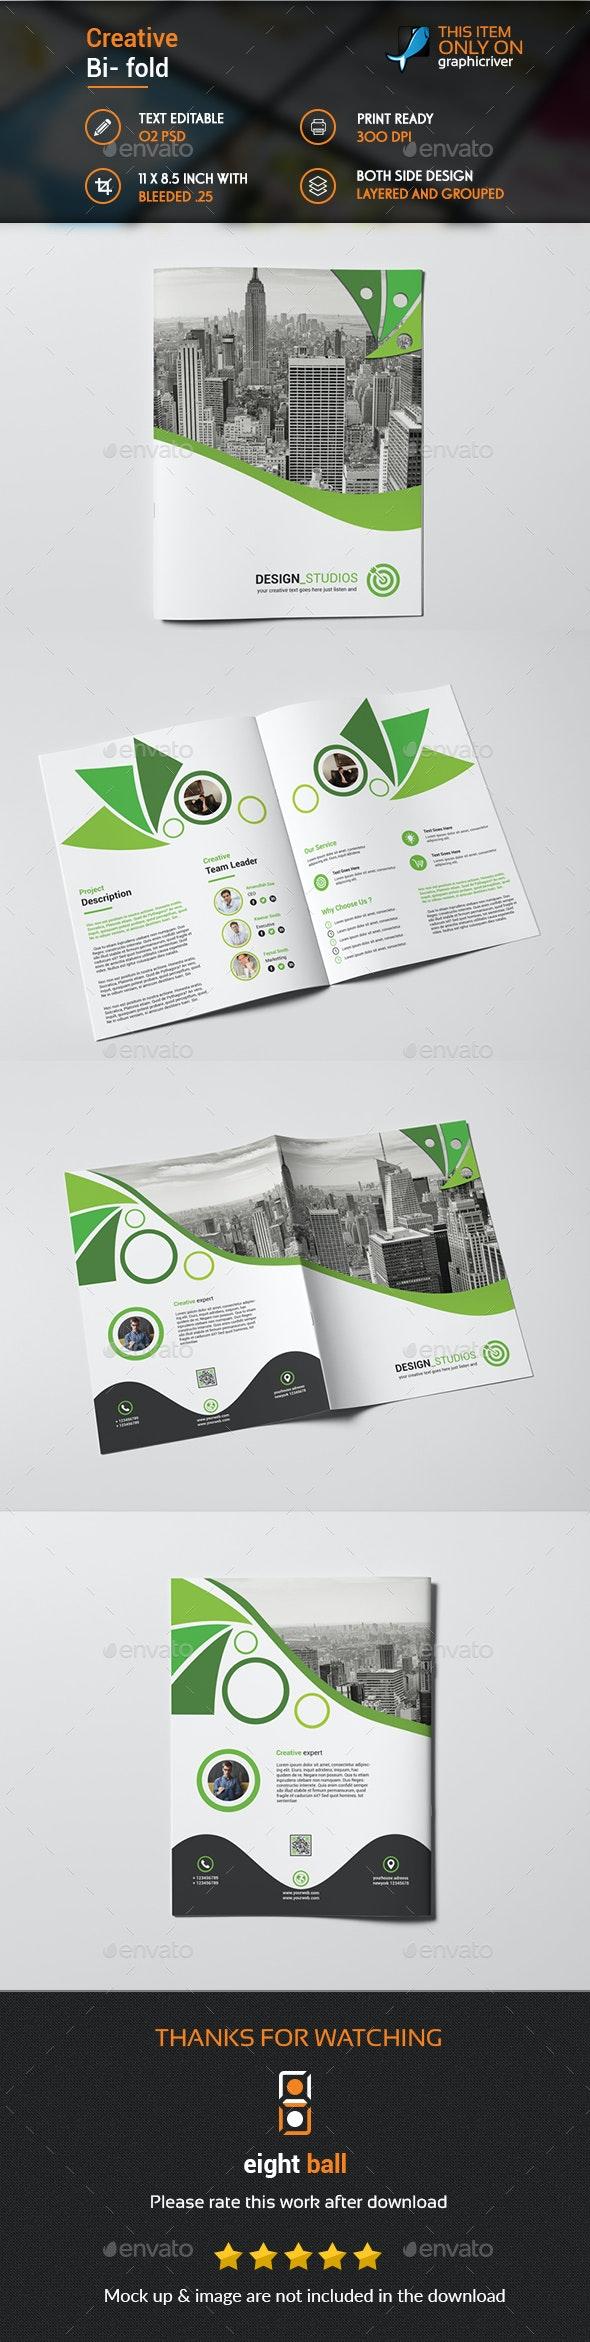 Creative Bi fold Brochureu Template - Brochures Print Templates